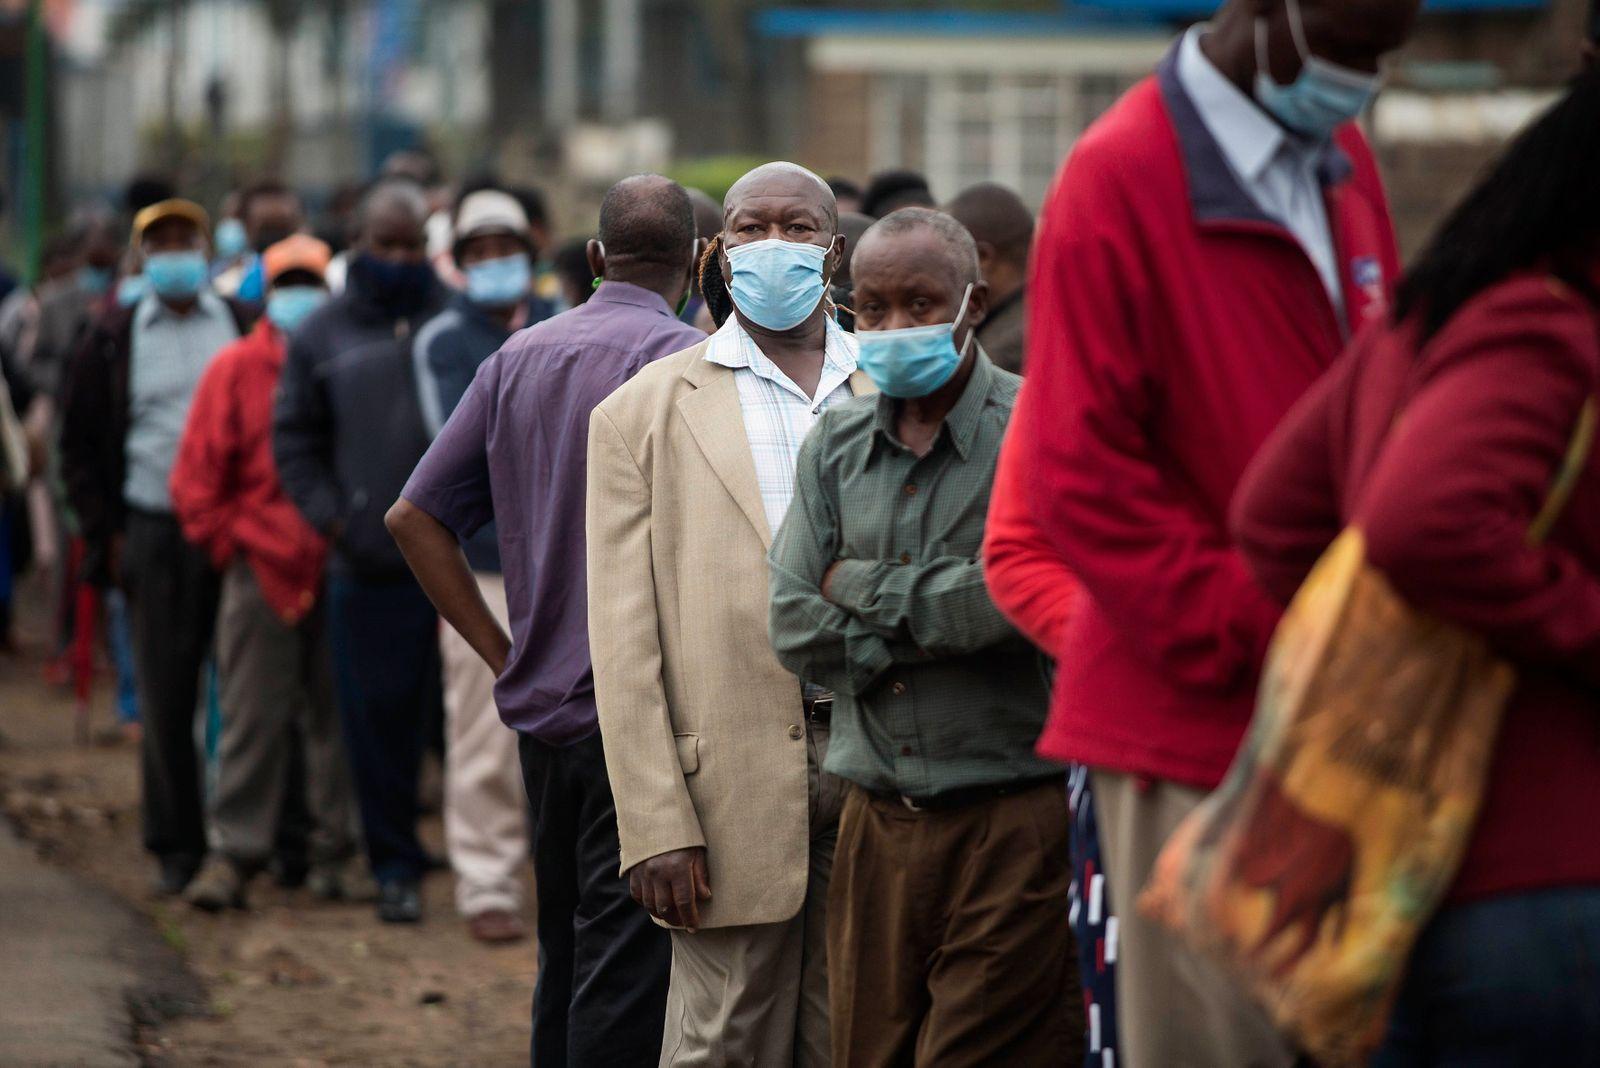 Phase 1 Of The Covid-19 Vaccination Program In Nairobi, Kenya